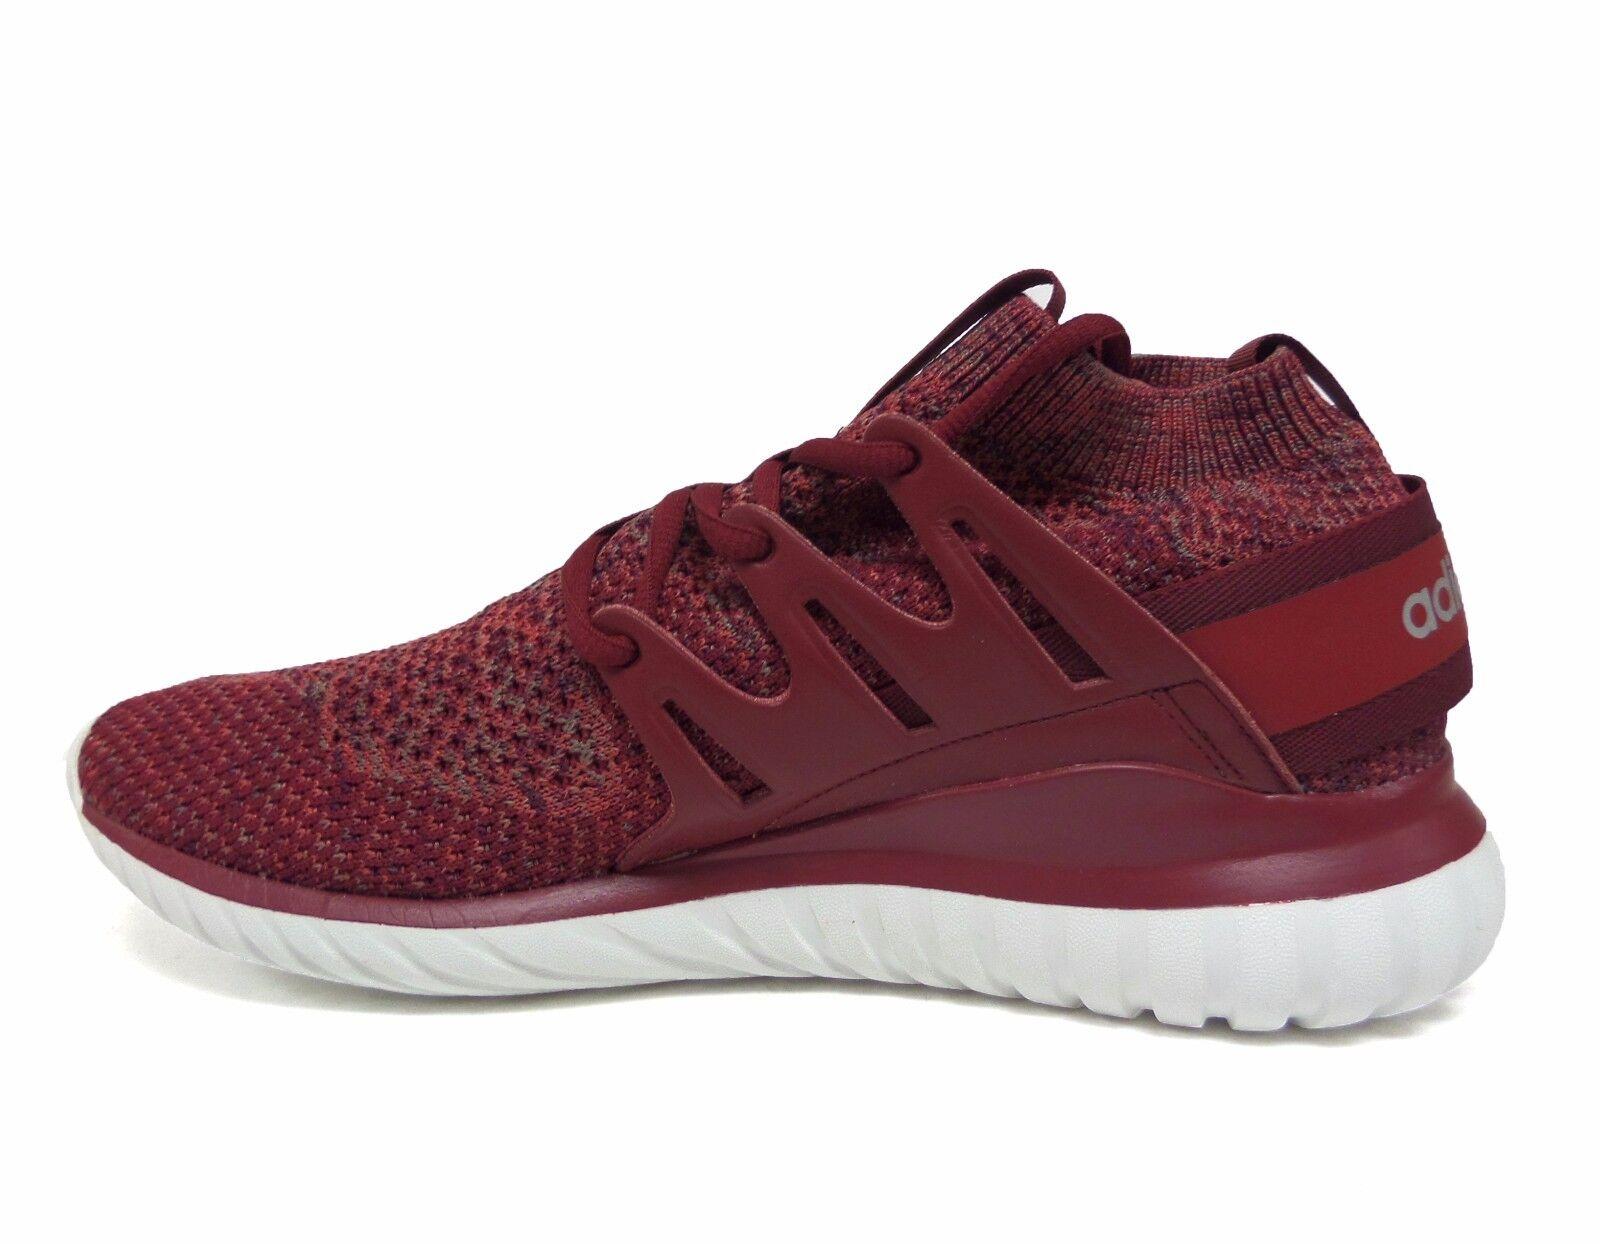 Adidas Originals Men's TUBULAR NOVA PRIMEKNIT Shoes Mystery Red BB8406 b